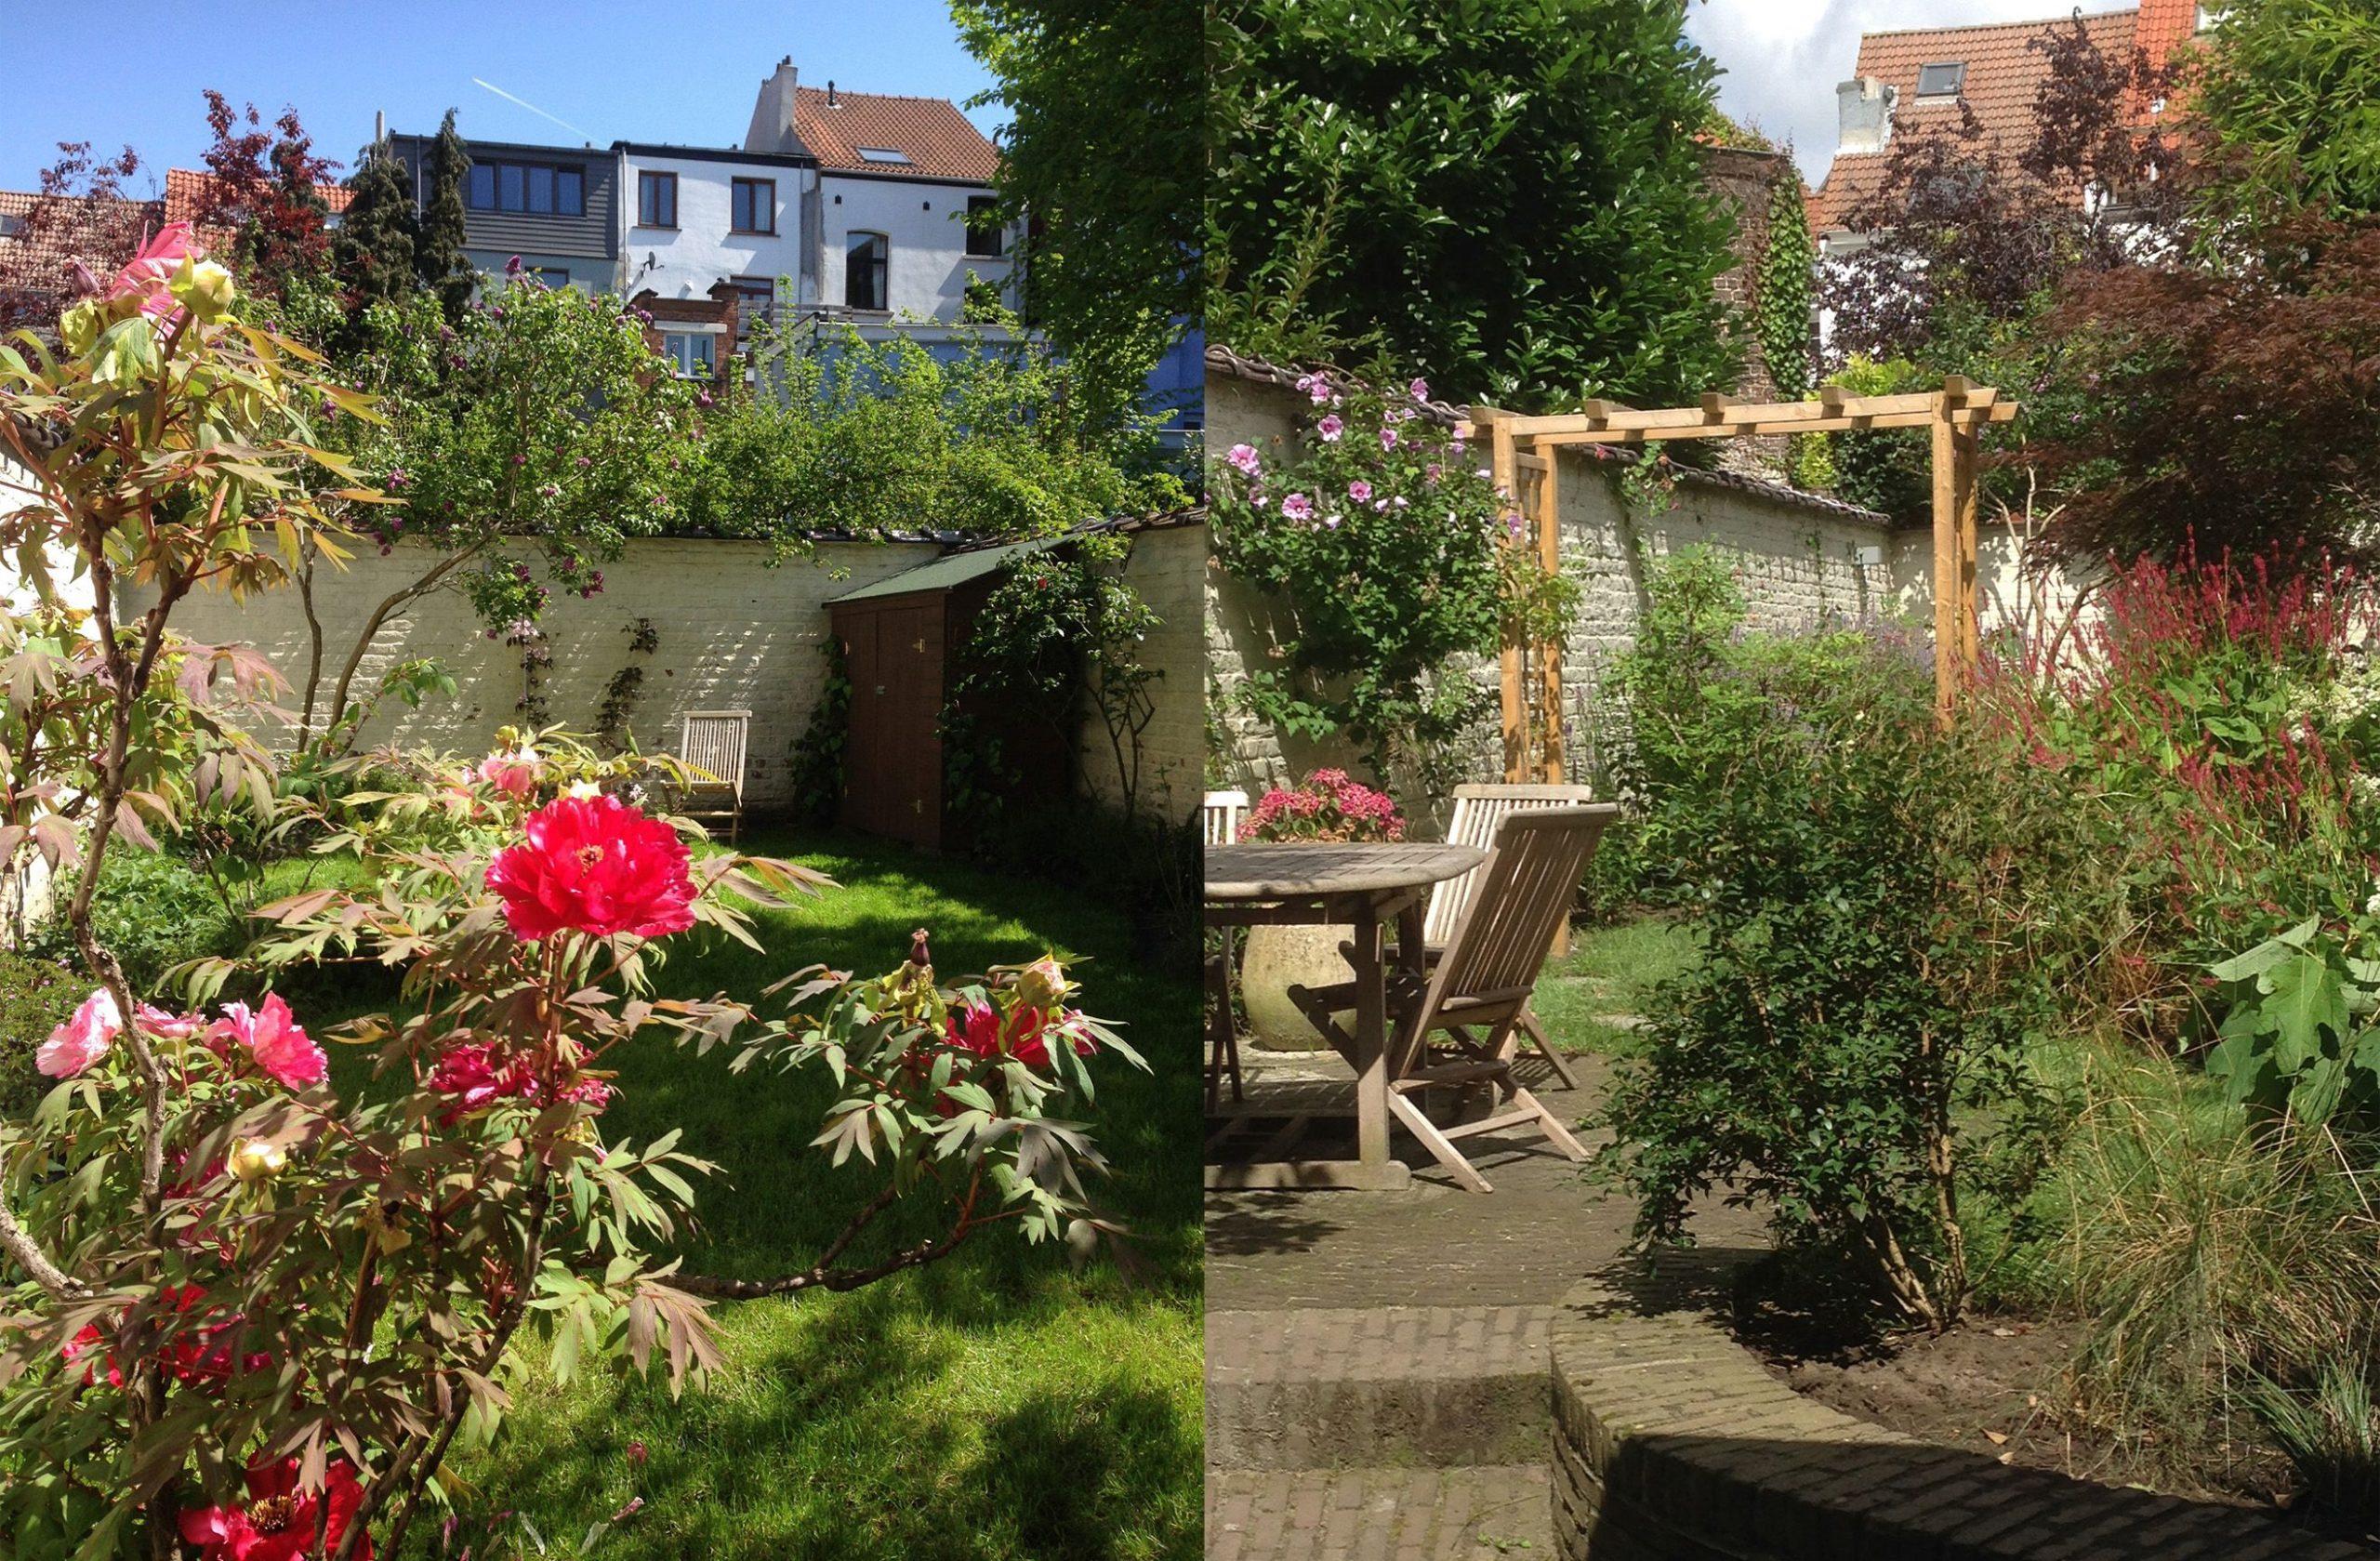 Jardin 100M2 - Bruxelles/ Marguerite Ferry - Urban Garden ... pour Arceau Jardin